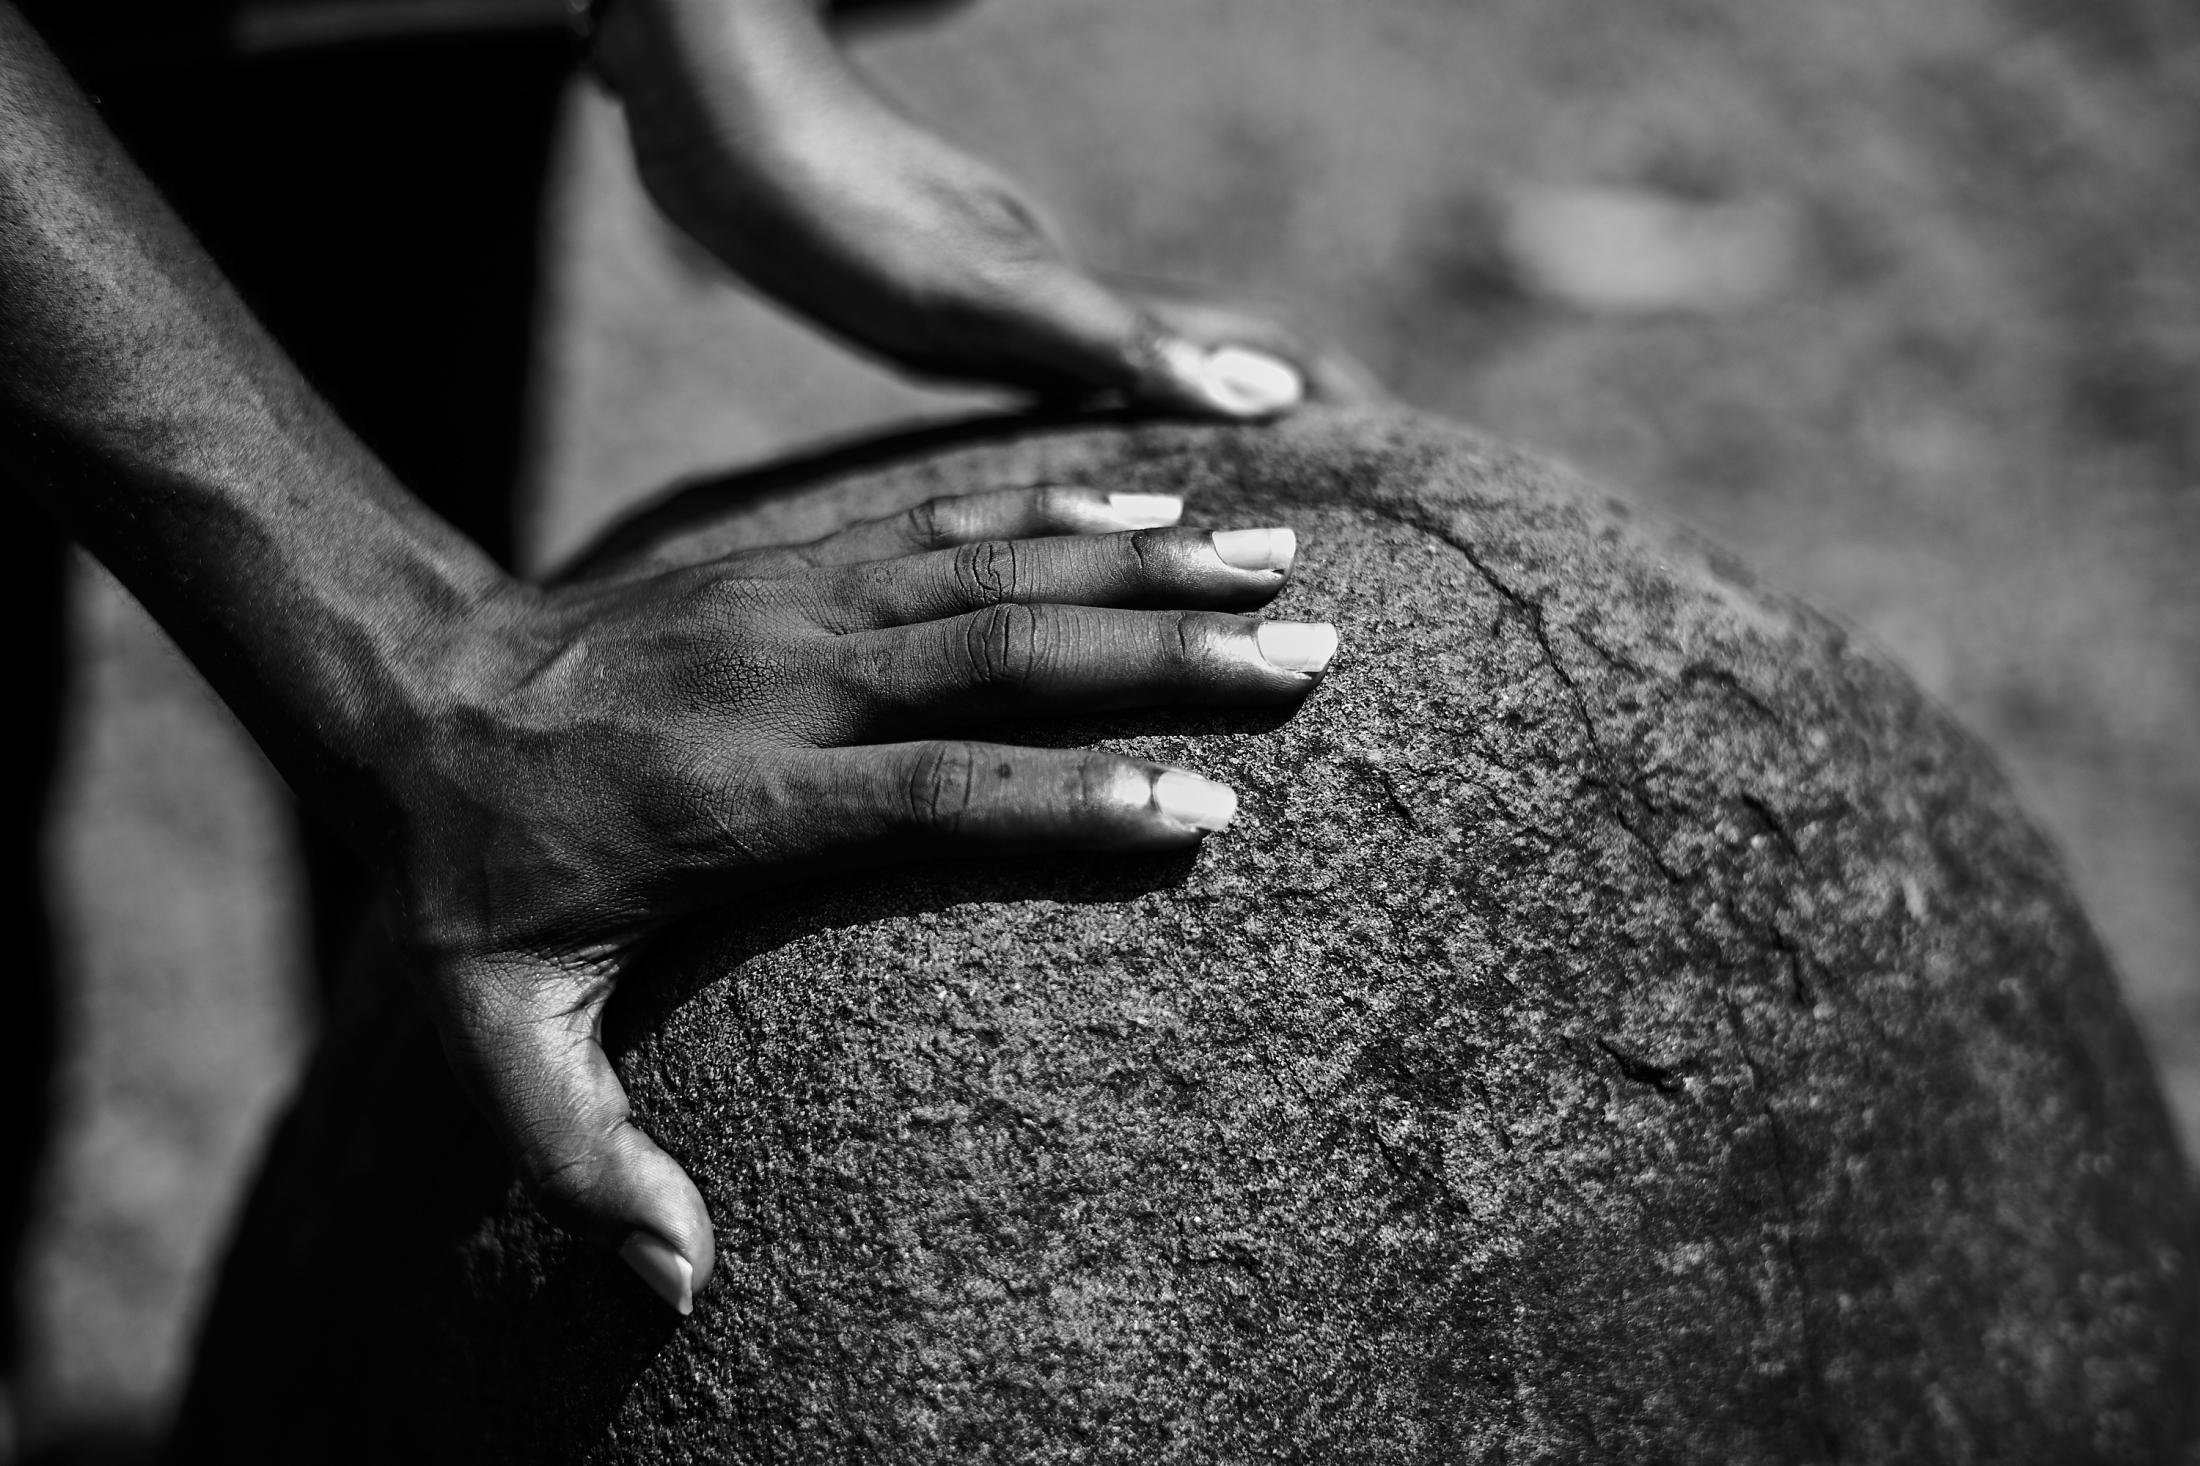 touching wisdom stone, open air monoliths museum,ikom (nigeria-cameroun border town), nigeria